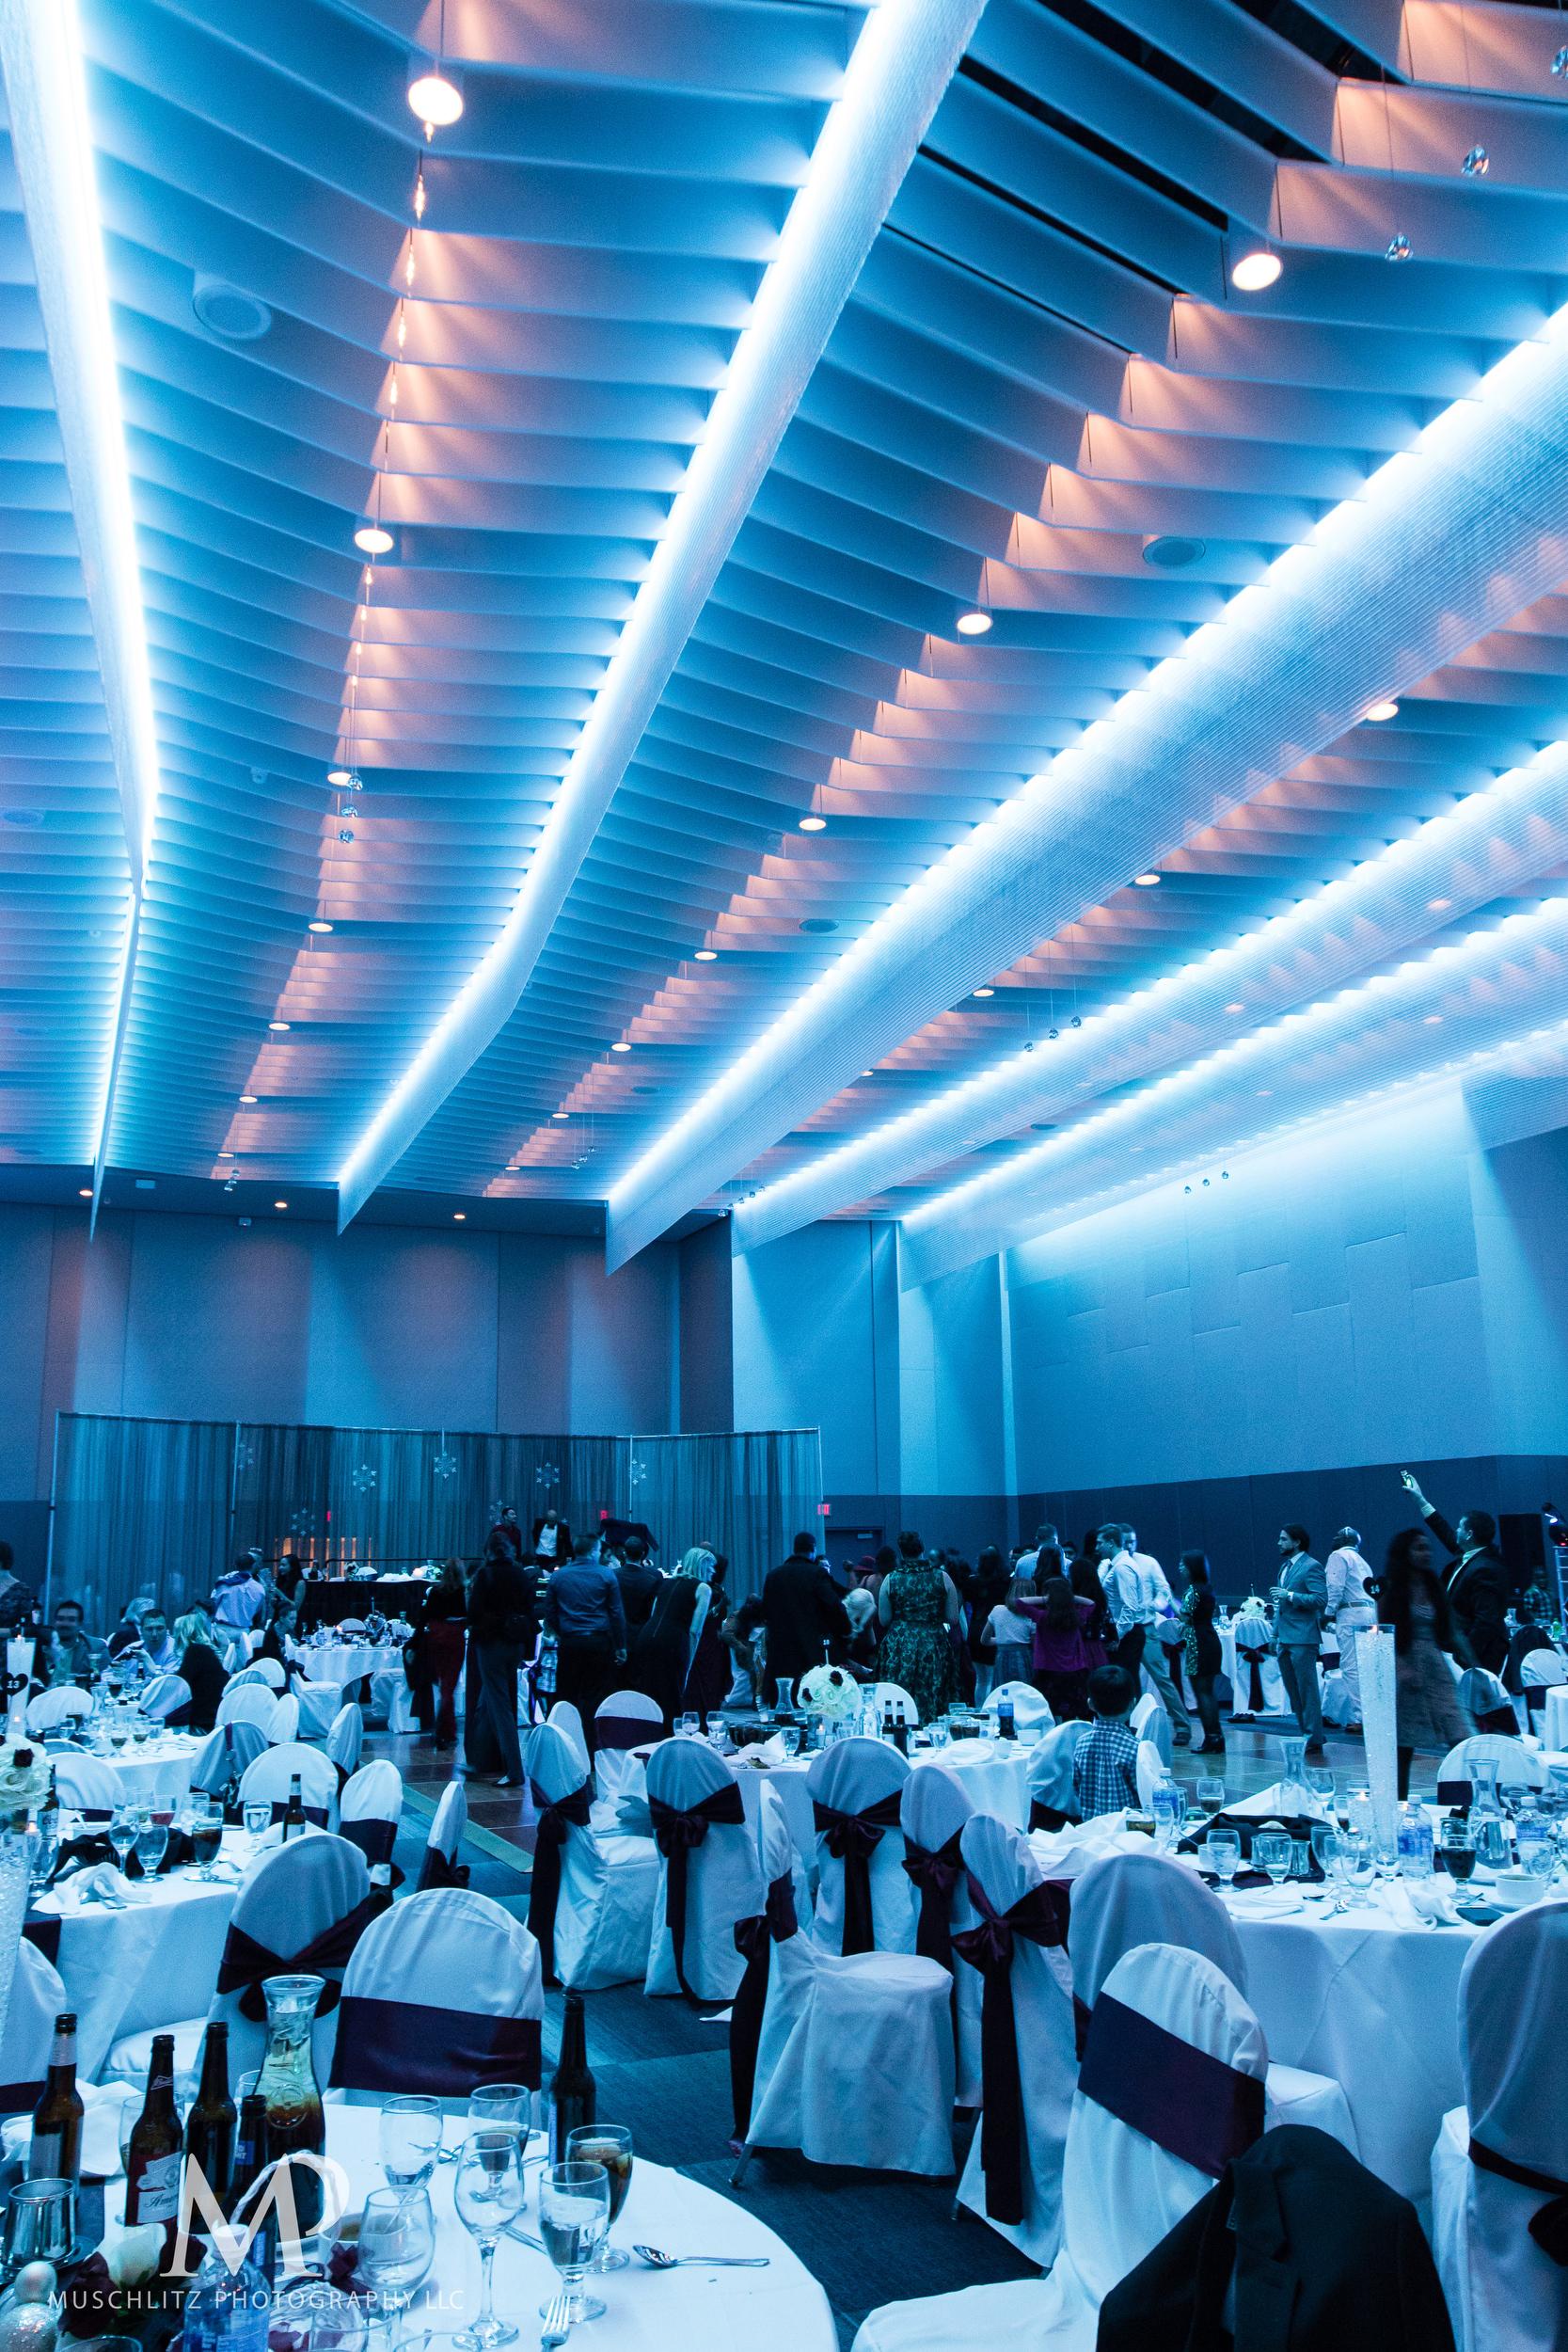 greater-columbus-convention-center-winter-wedding-ceremony-reception-portraits-columbus-ohio-muschlitz-photography-086.JPG